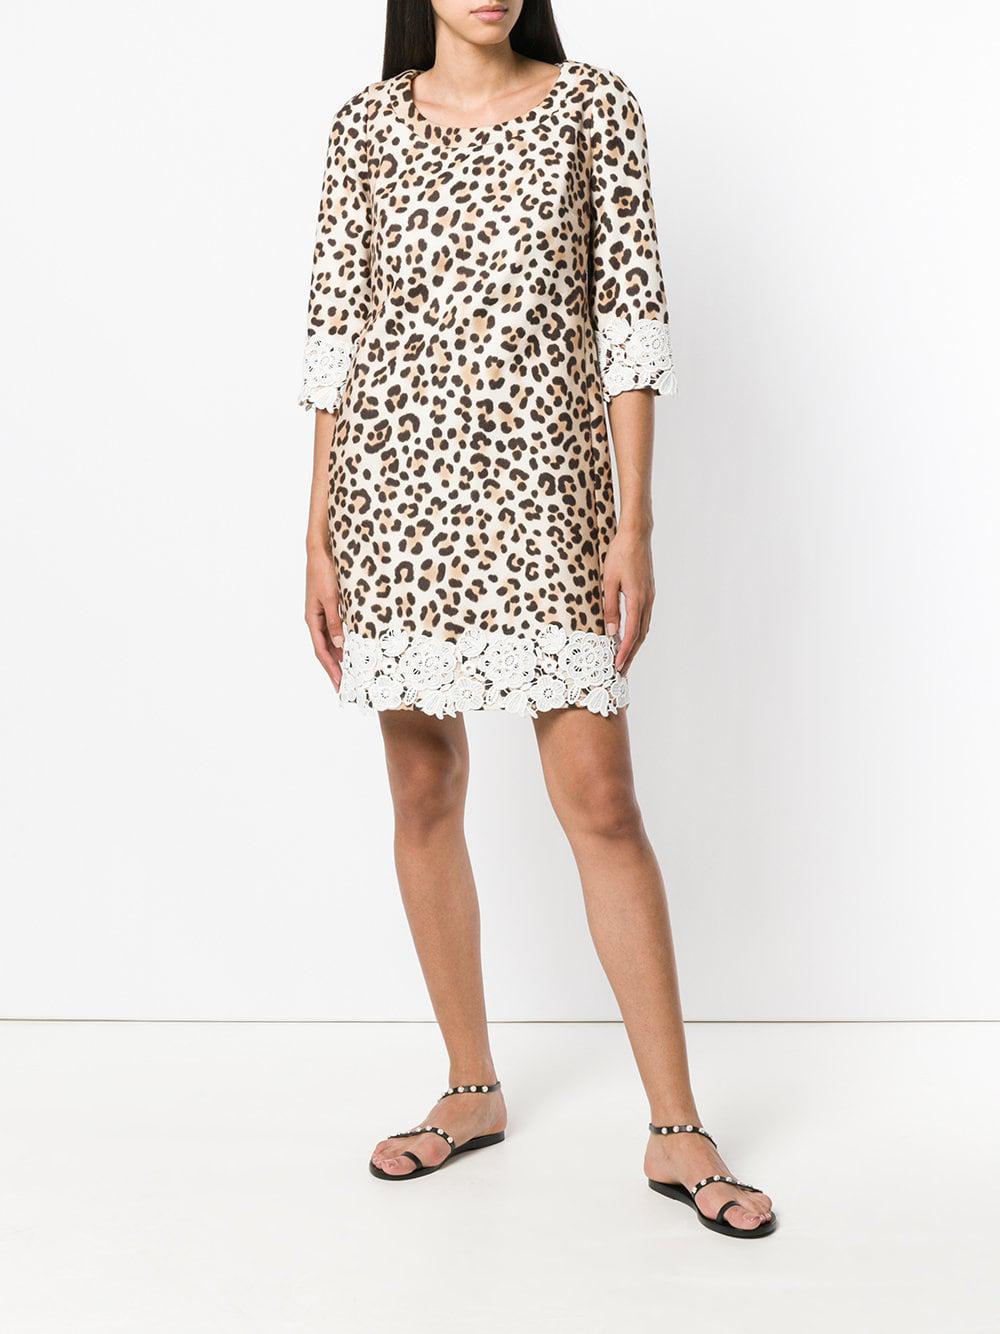 593244a65c Blumarine - Multicolor Leopard Print Shift Dress - Lyst. View fullscreen